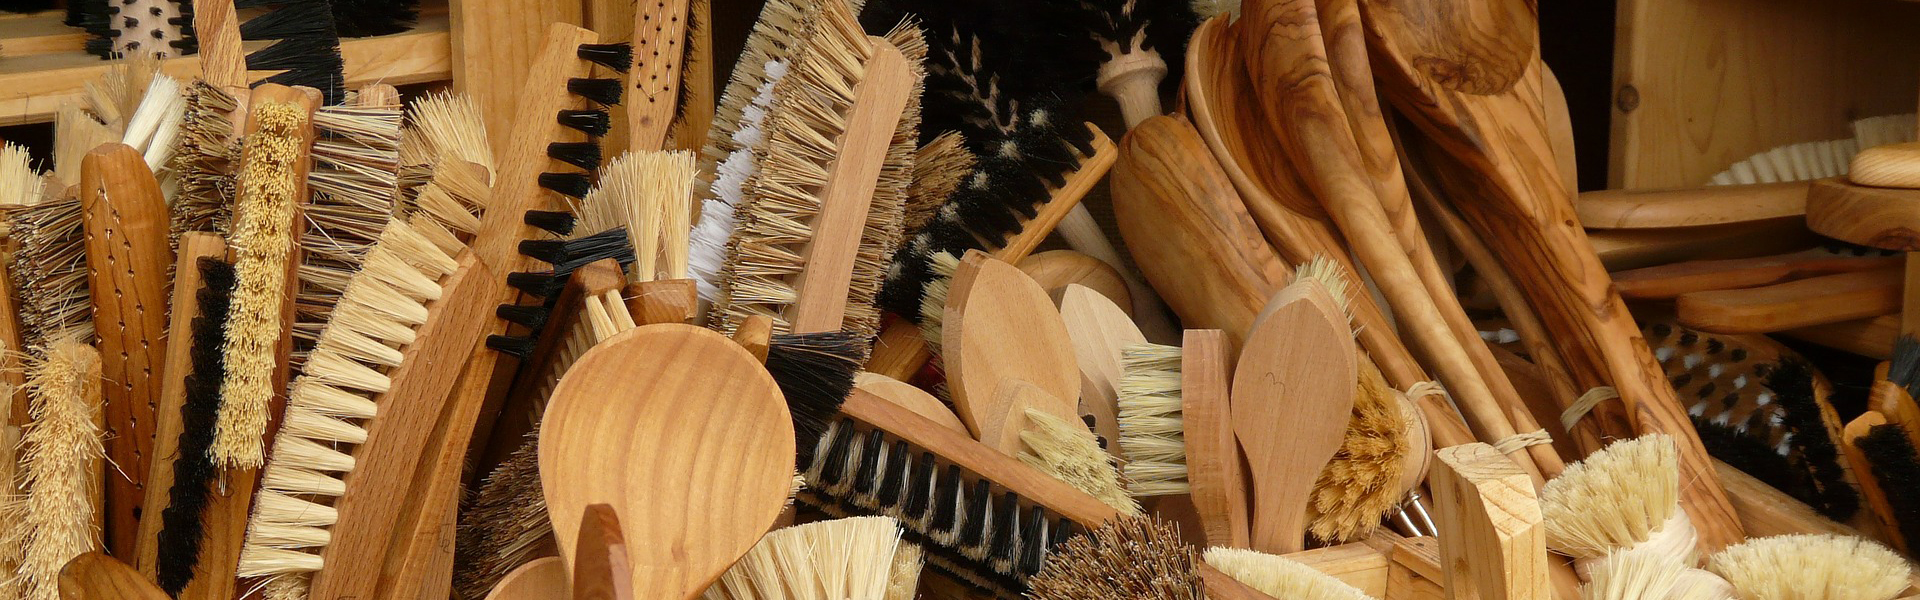 brosses-bio-blank-home-bois-ricin-environnement-verneco-vannes-bretagne